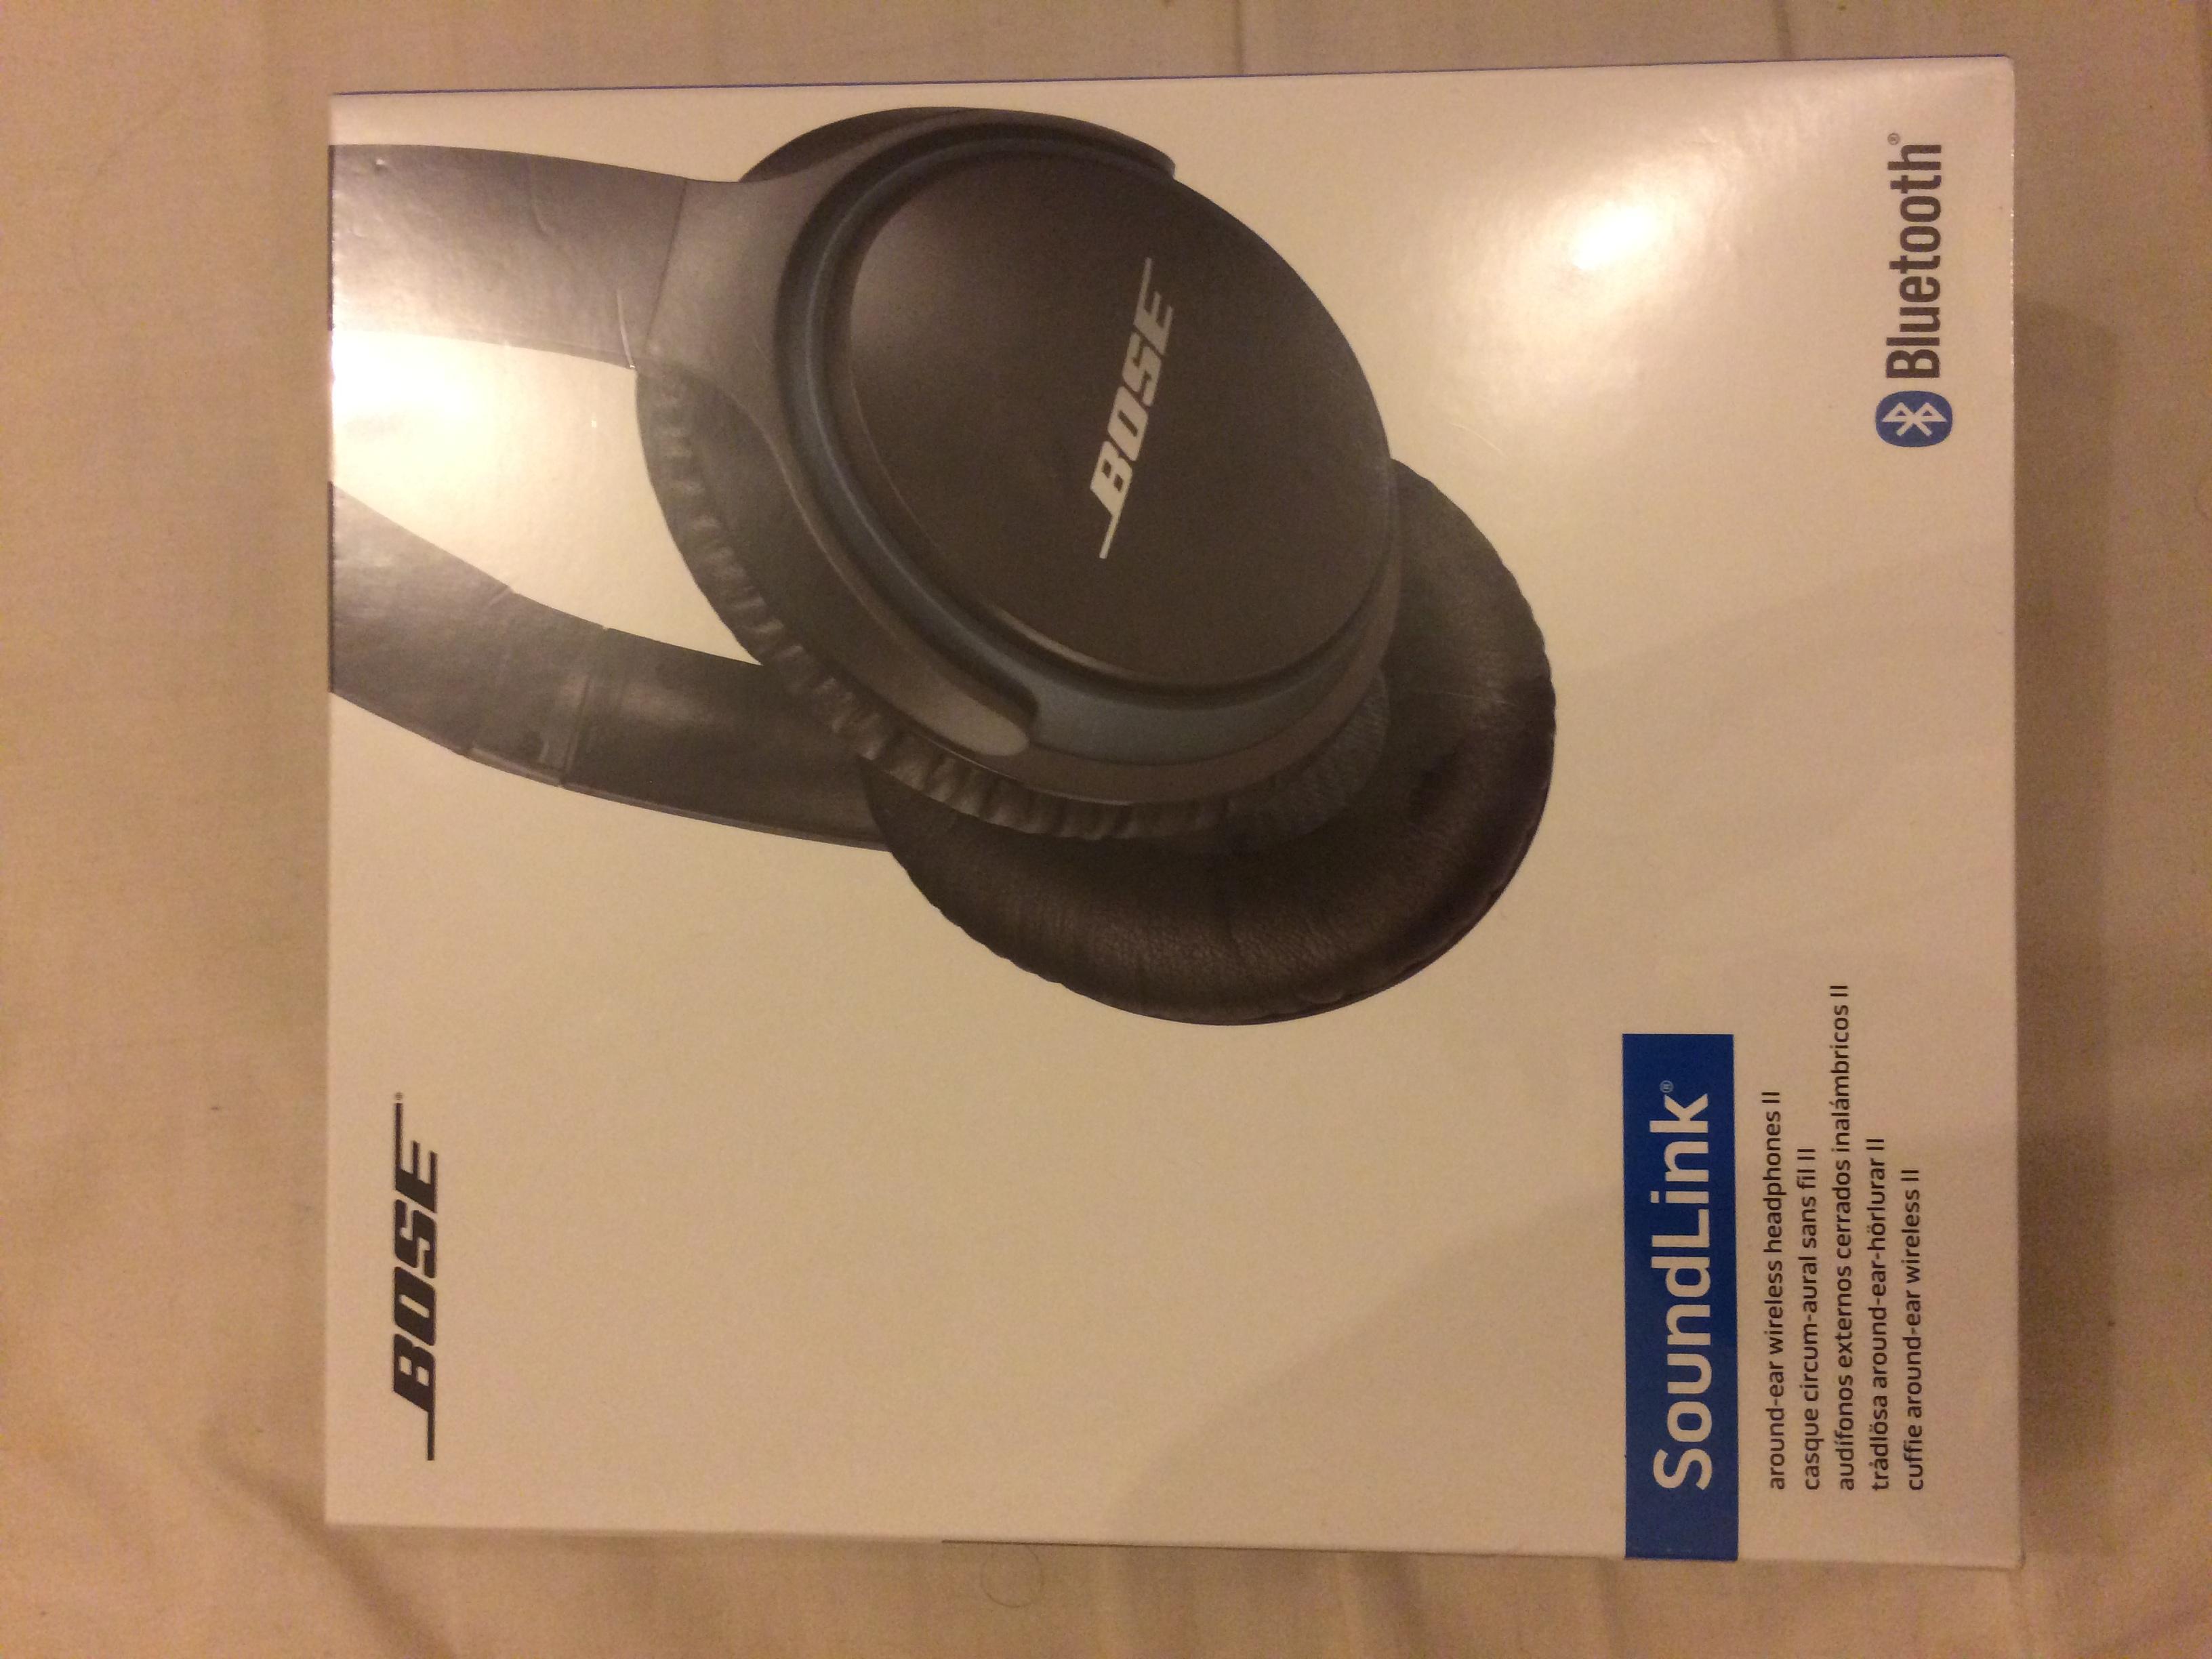 Bose SoundLink Around-Ear Wireless Headphones II  0491174a20d33